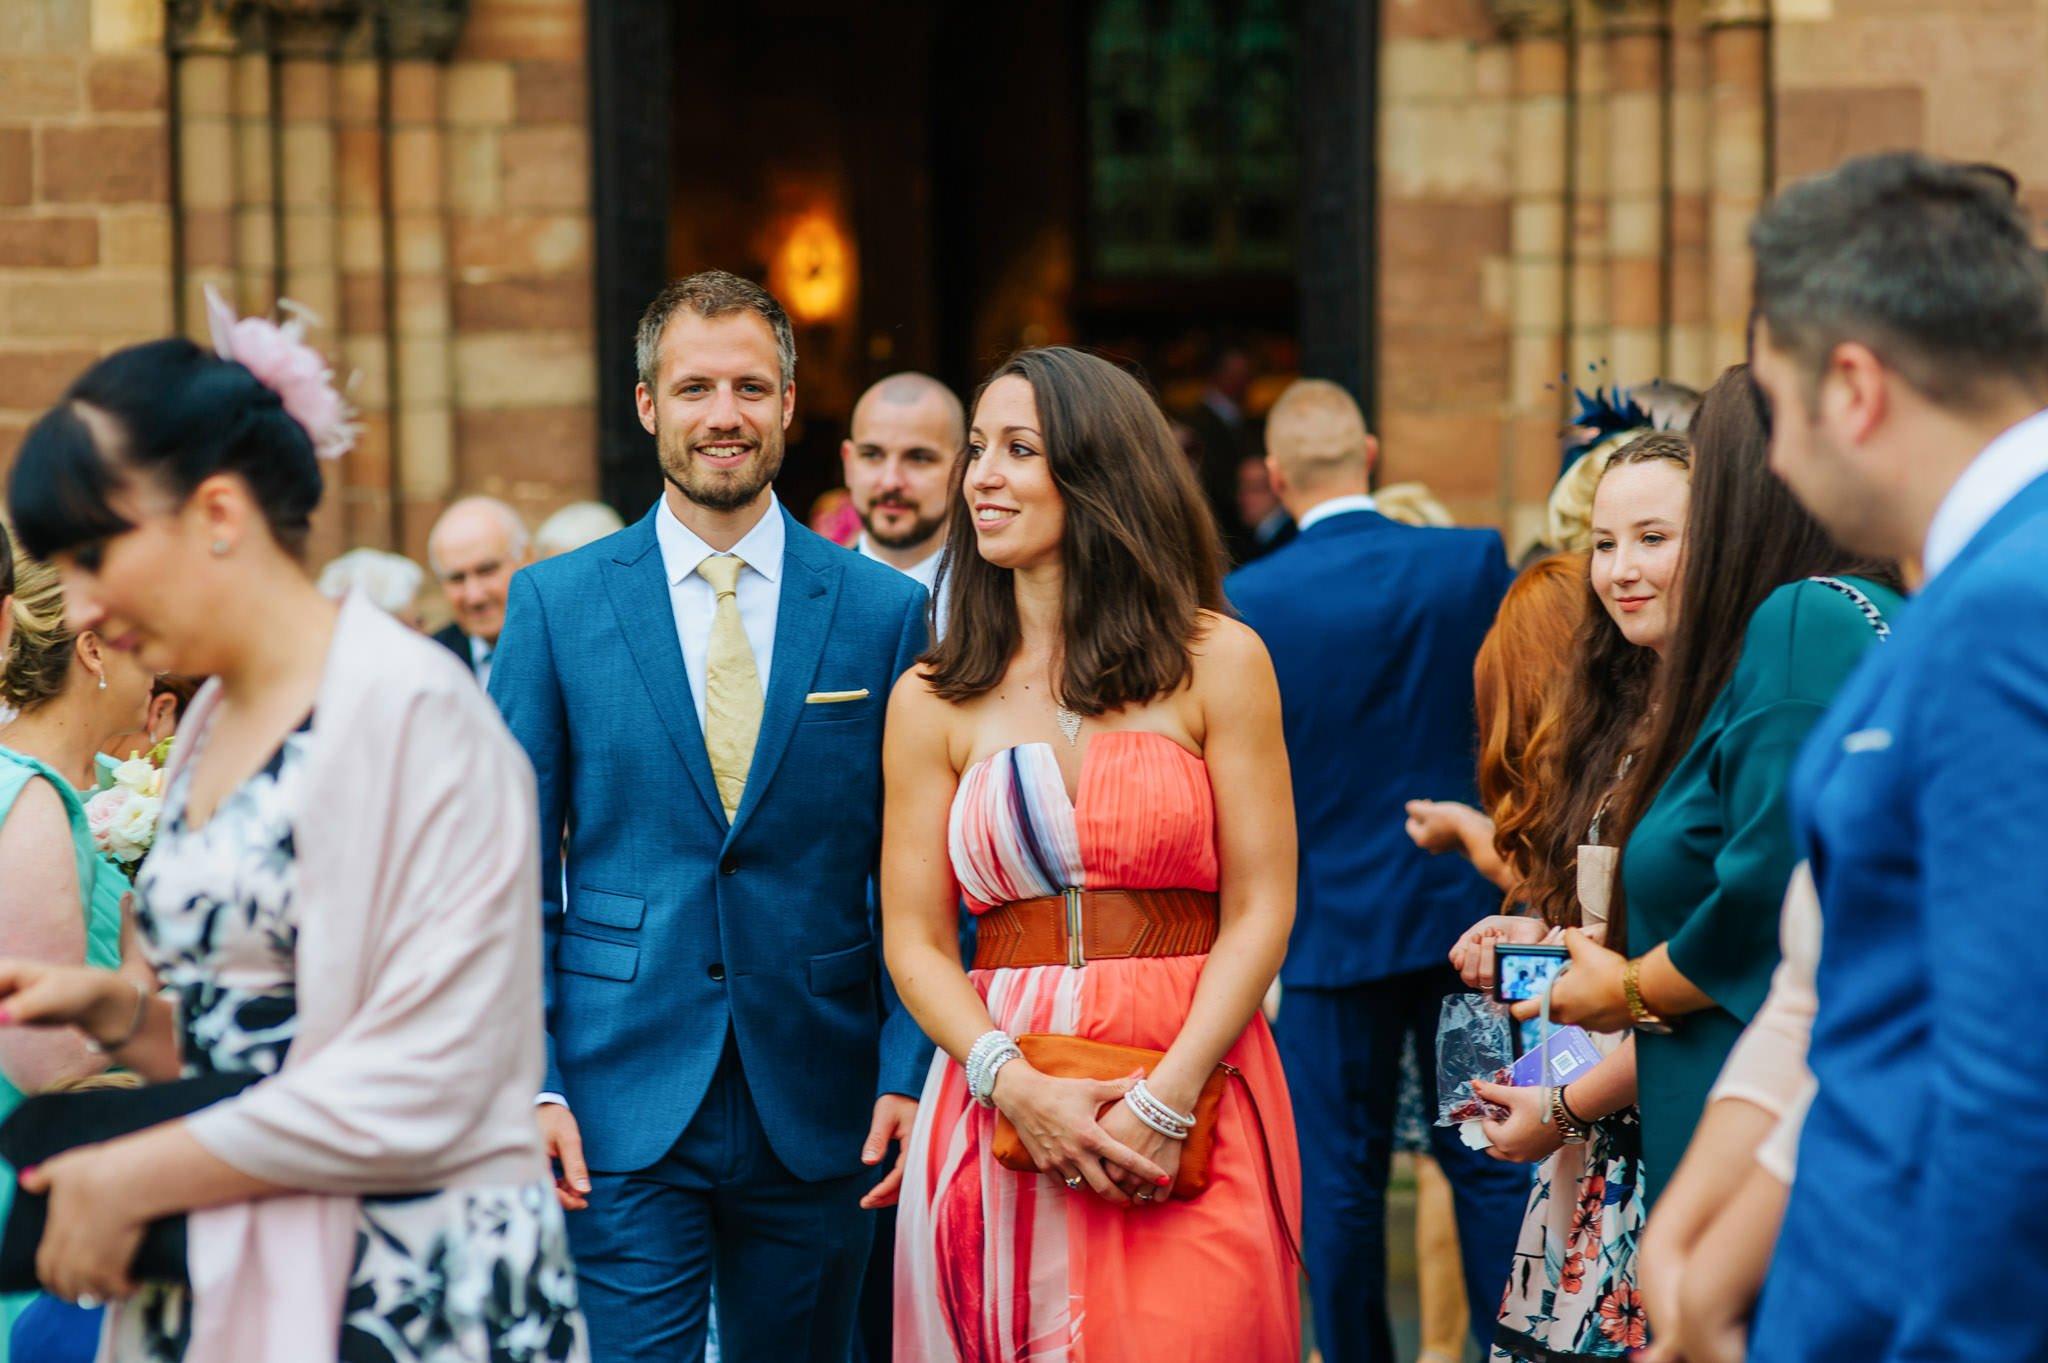 Eastnor Castle wedding photographer Herefordshire, West Midlands - Sarah + Dean 38